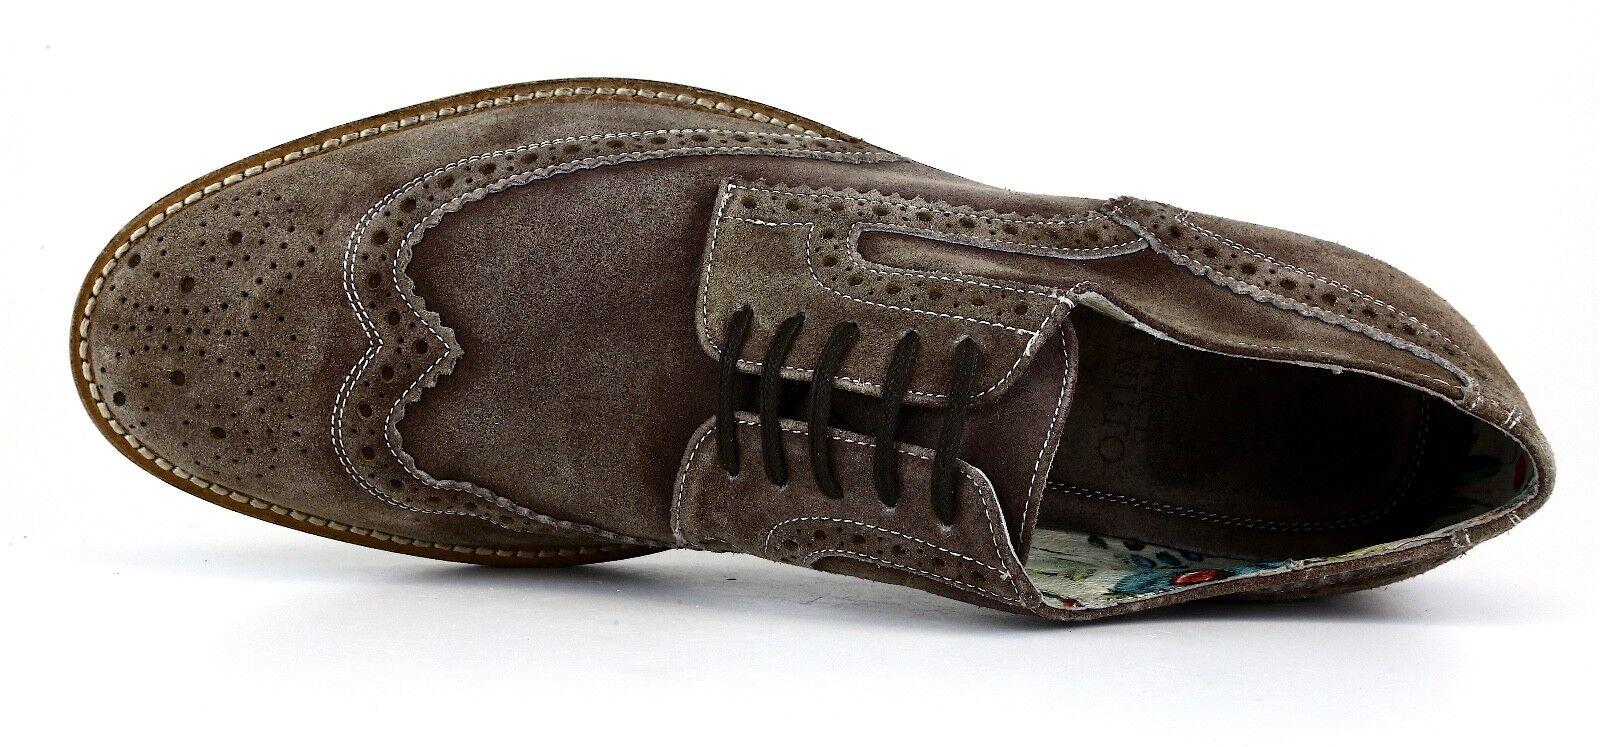 Vince Camuto Venety Venety Venety Suede Oxford Shoe Brown Uomo Sz 12 D 1259 3d8217